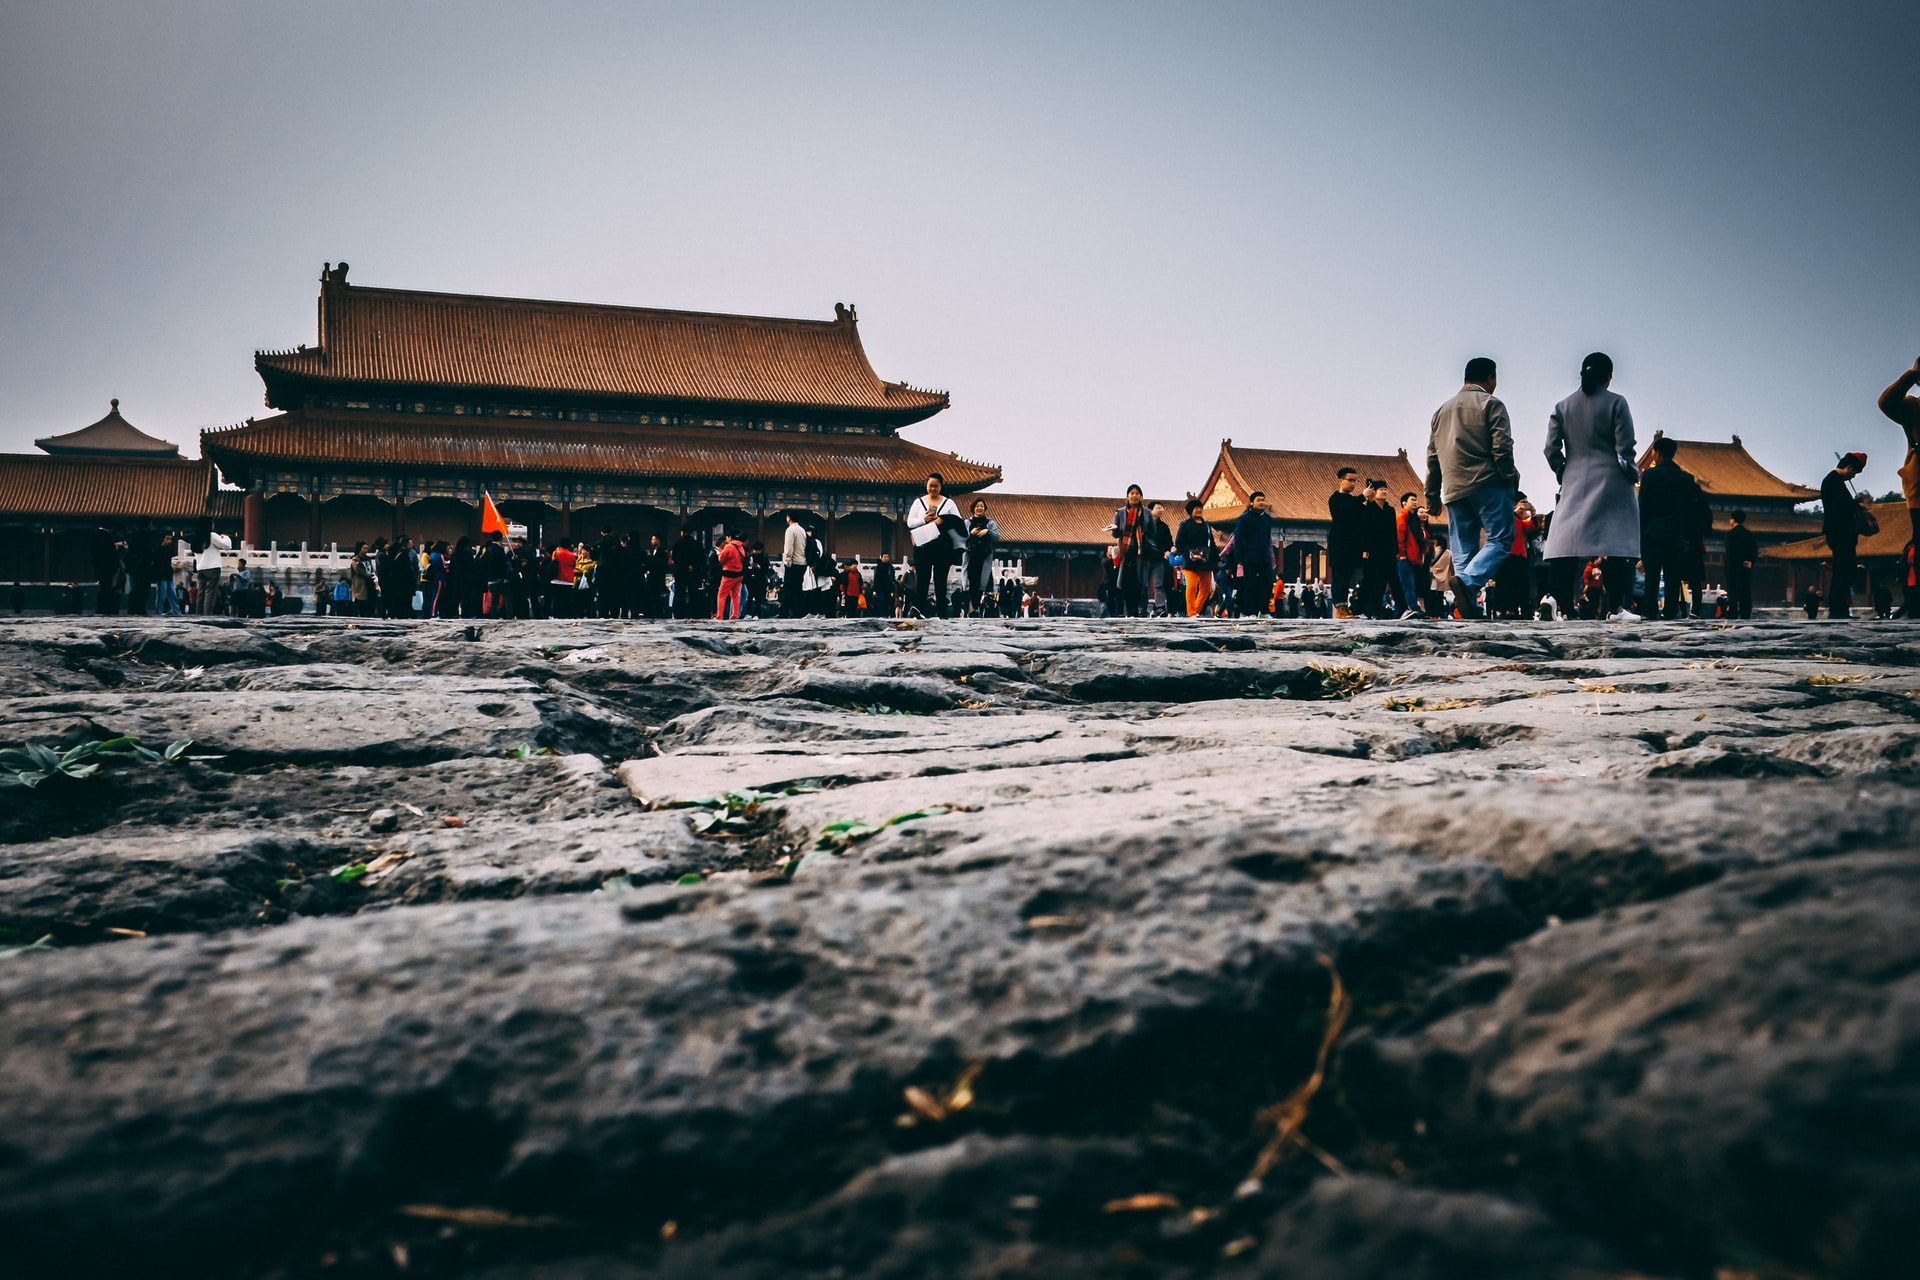 中国政府の貧困政策